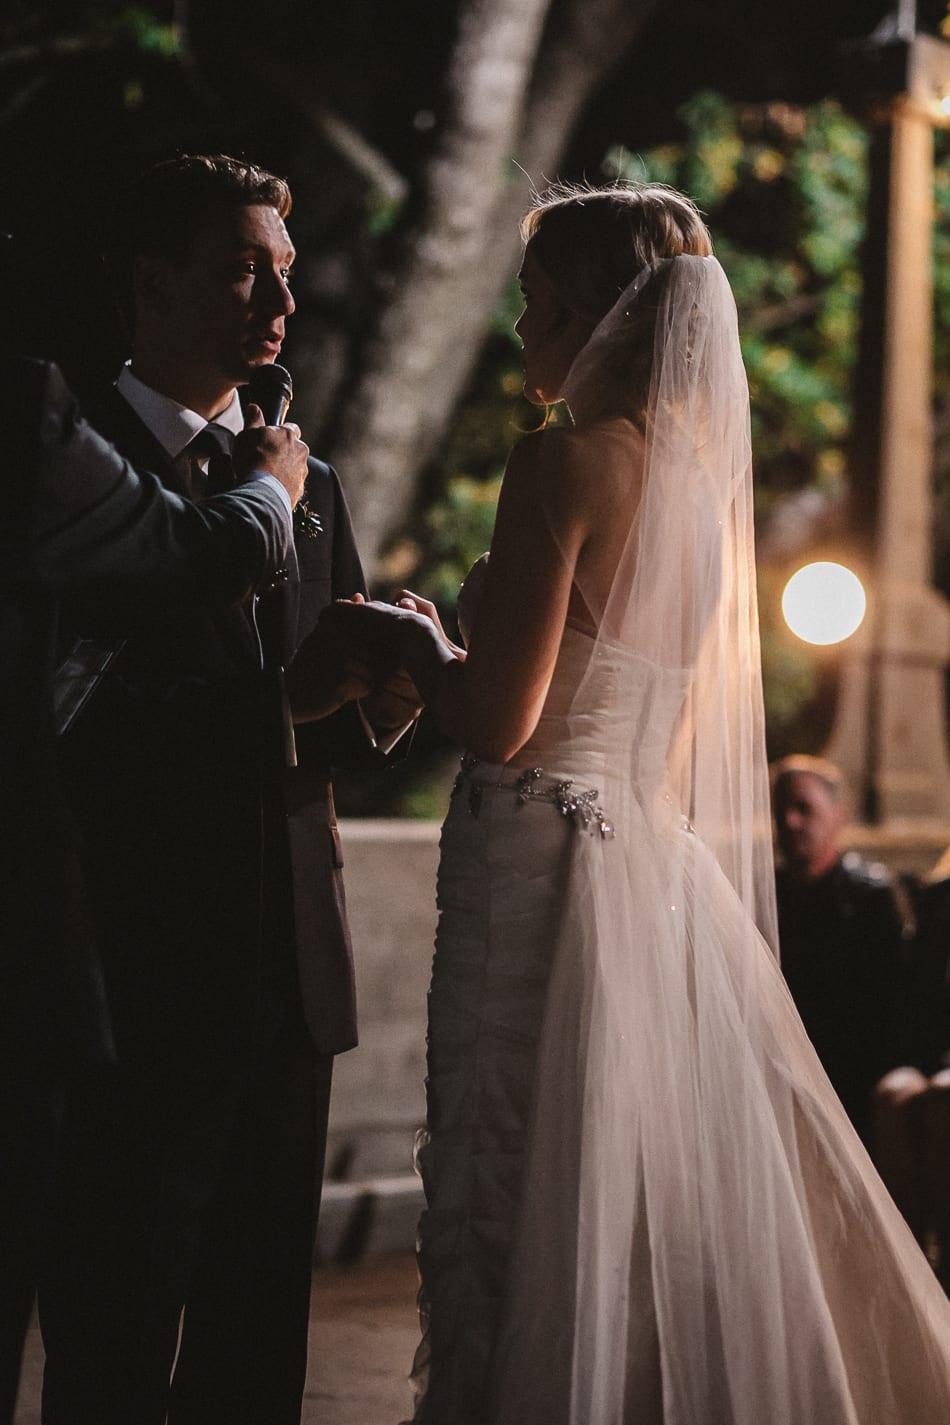 lake-redding-park-diesel-horse-bridge-view202-california-wedding-photographer-22